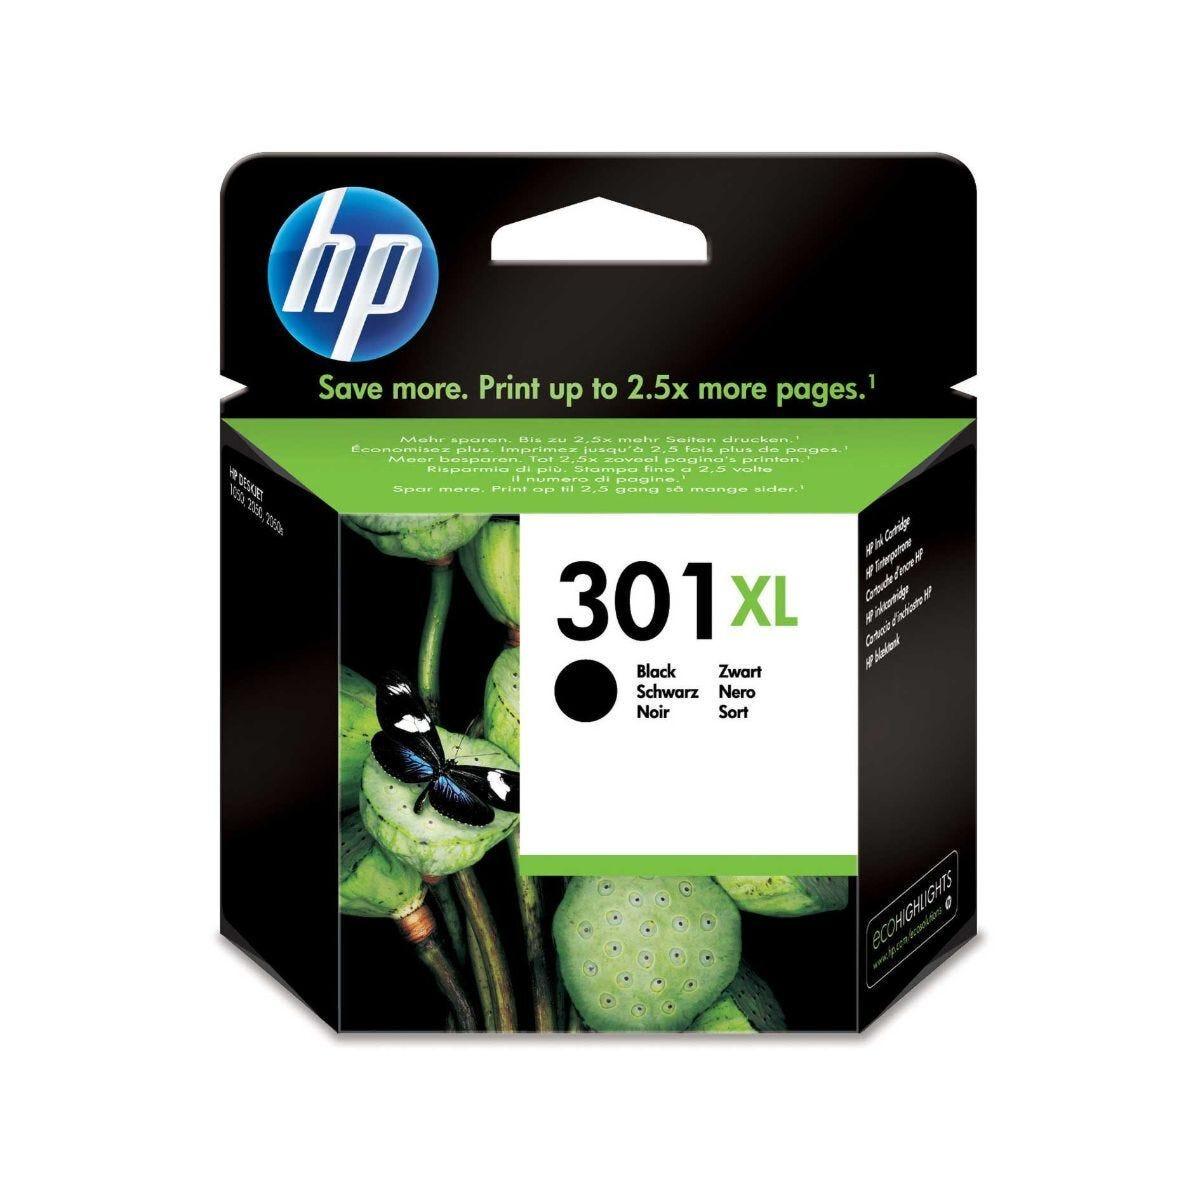 HP  301XL Inkjet Cartridge Black